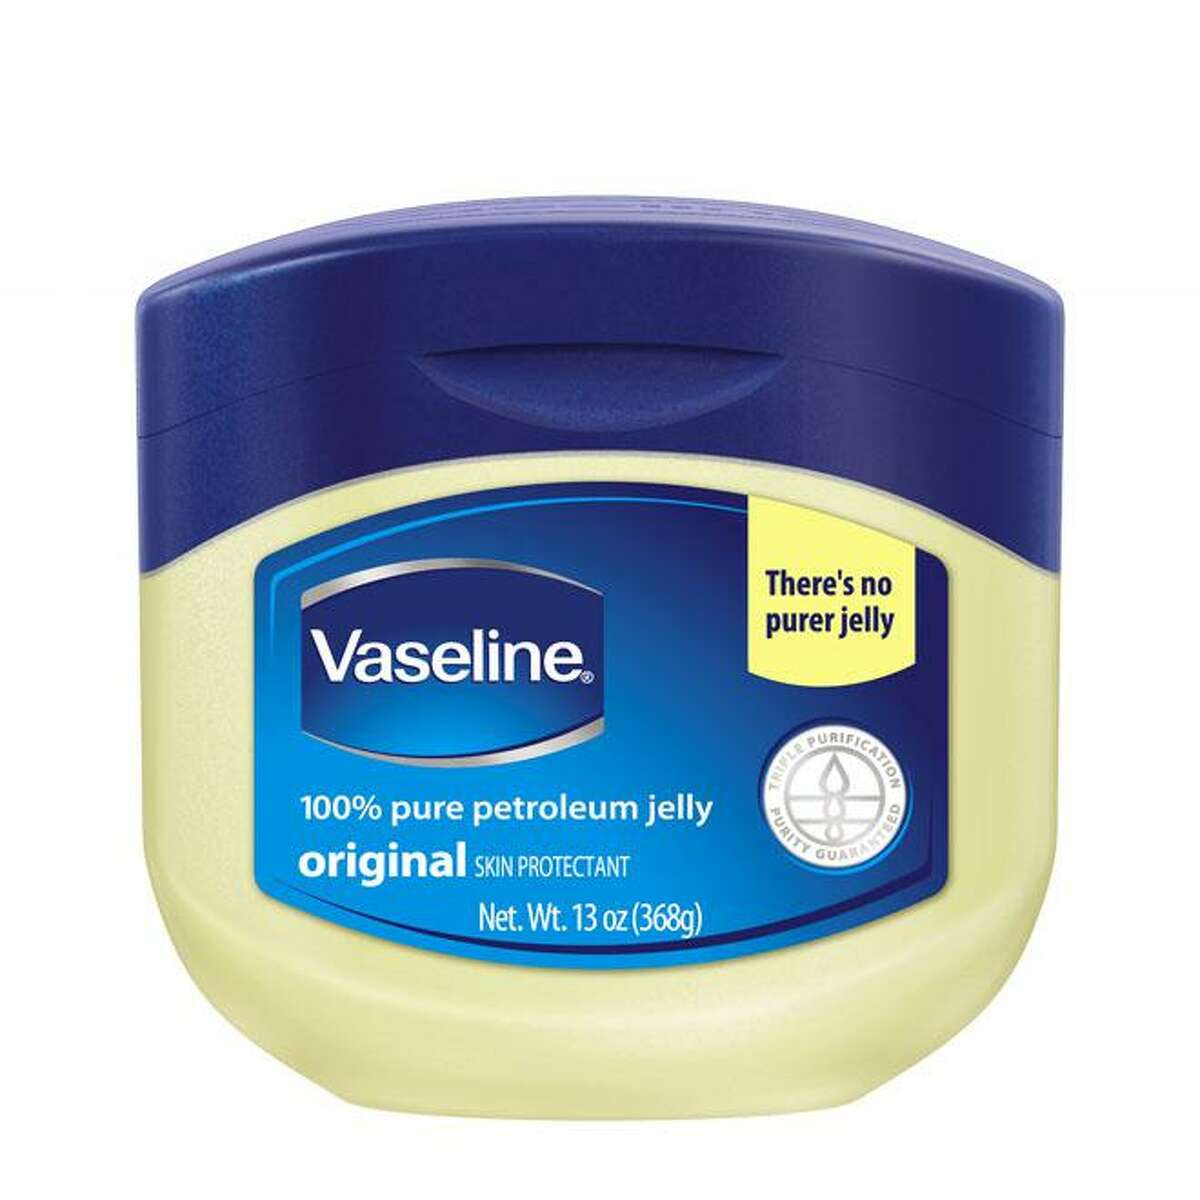 credit: Vaseline cutline: VaselineÂAE Petroleum Jelly, one of the worldâÄôs most iconic multi-tasking products, is celebrating its 140th anniversary.